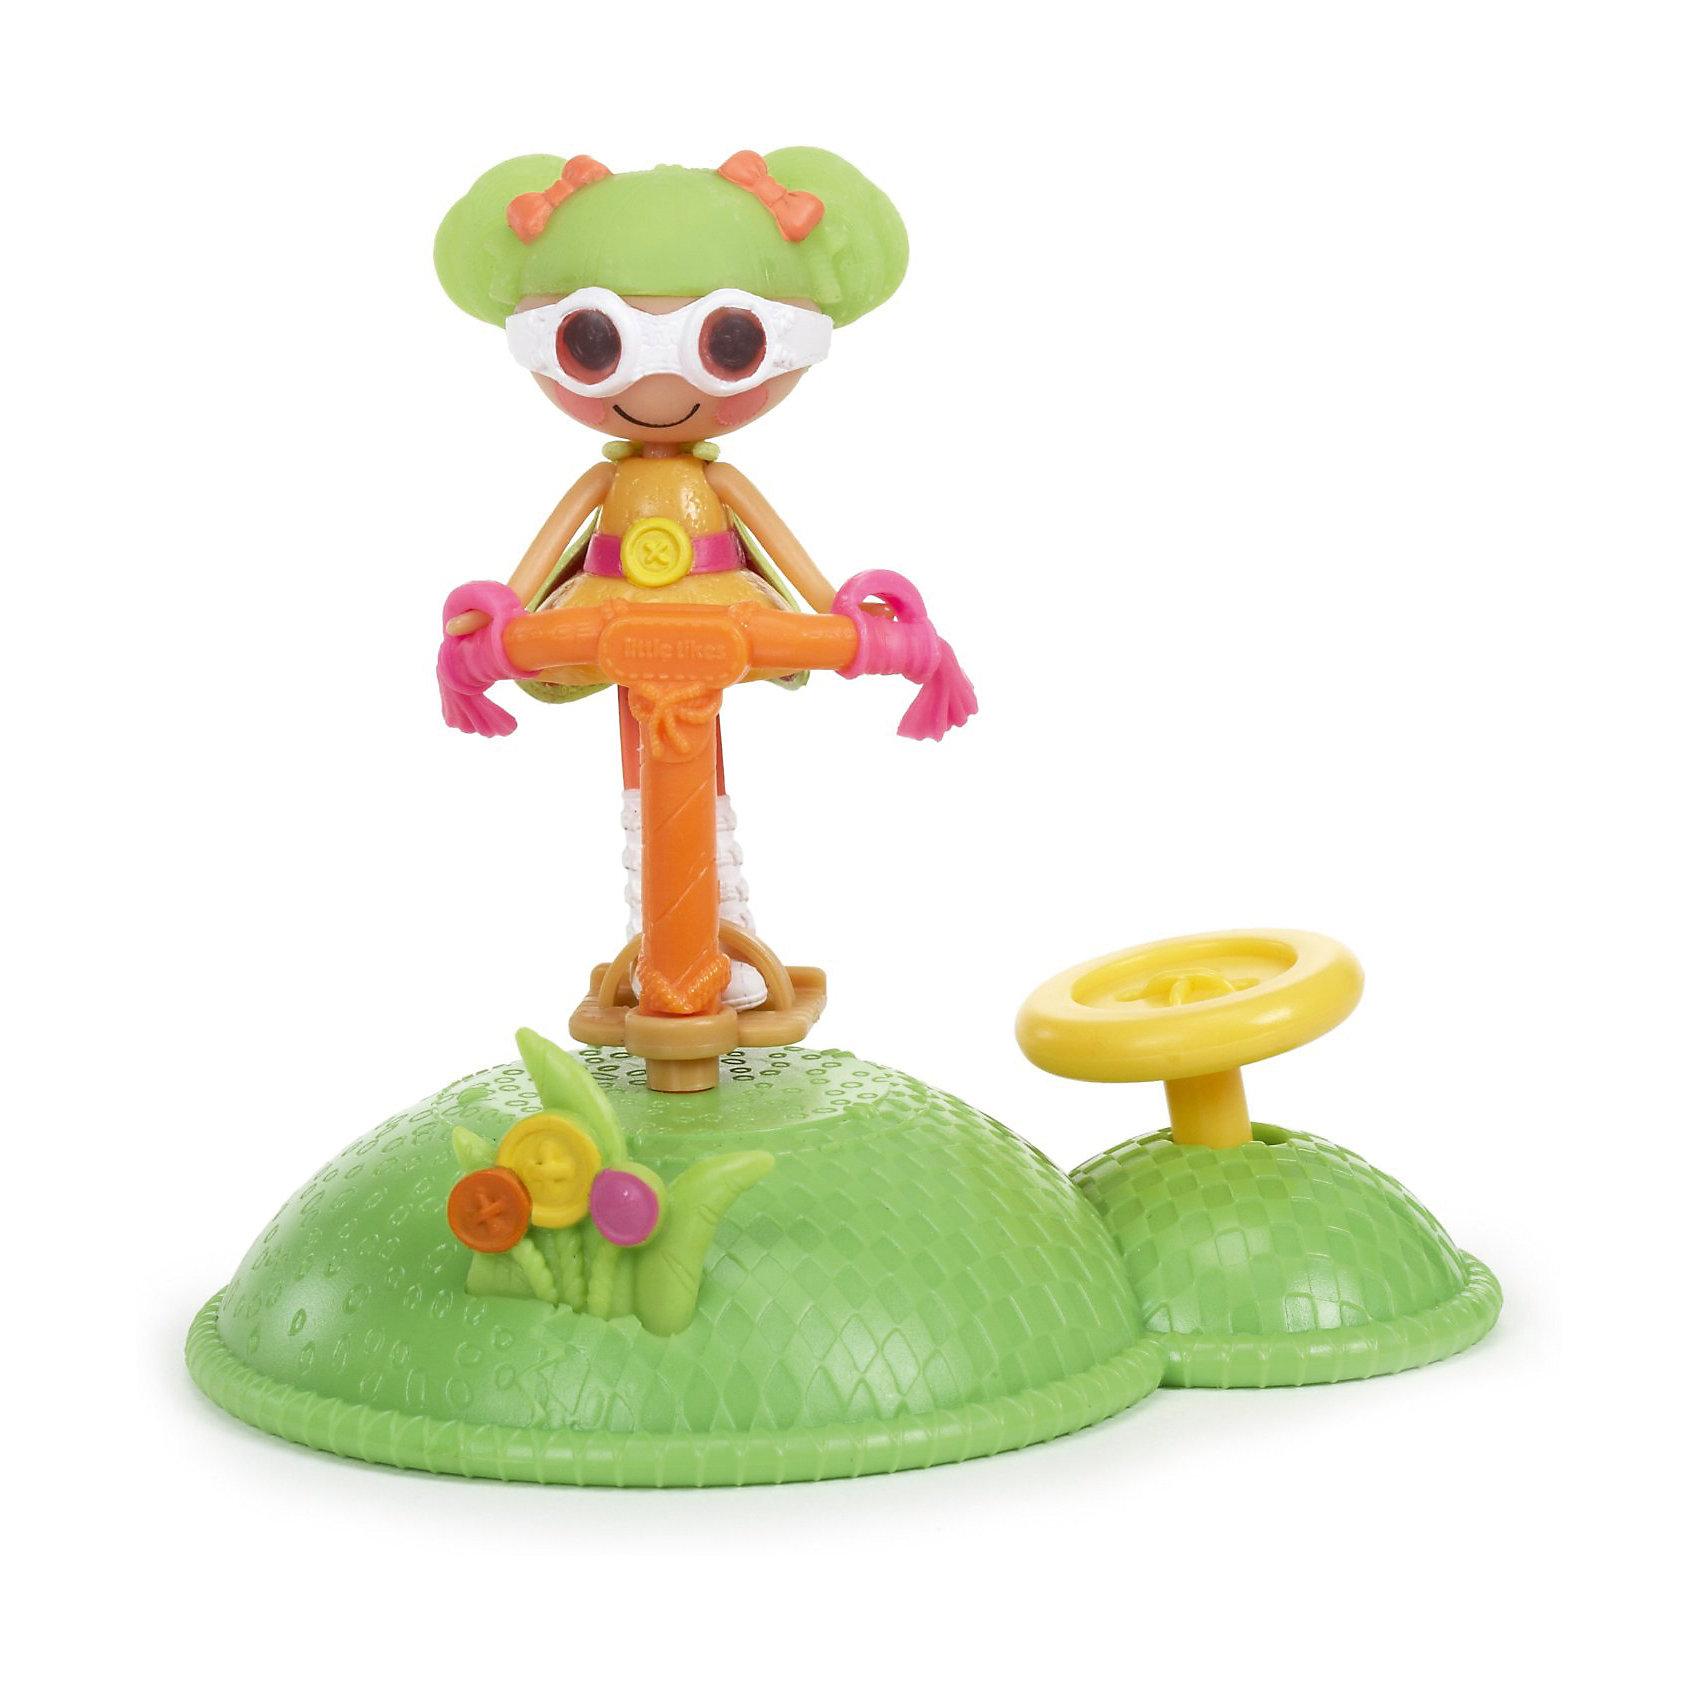 - Кукла Веселый спорт: Ходуля, Mini Lalaloopsy кукла lalaloopsy mini с интерьером в ассортименте